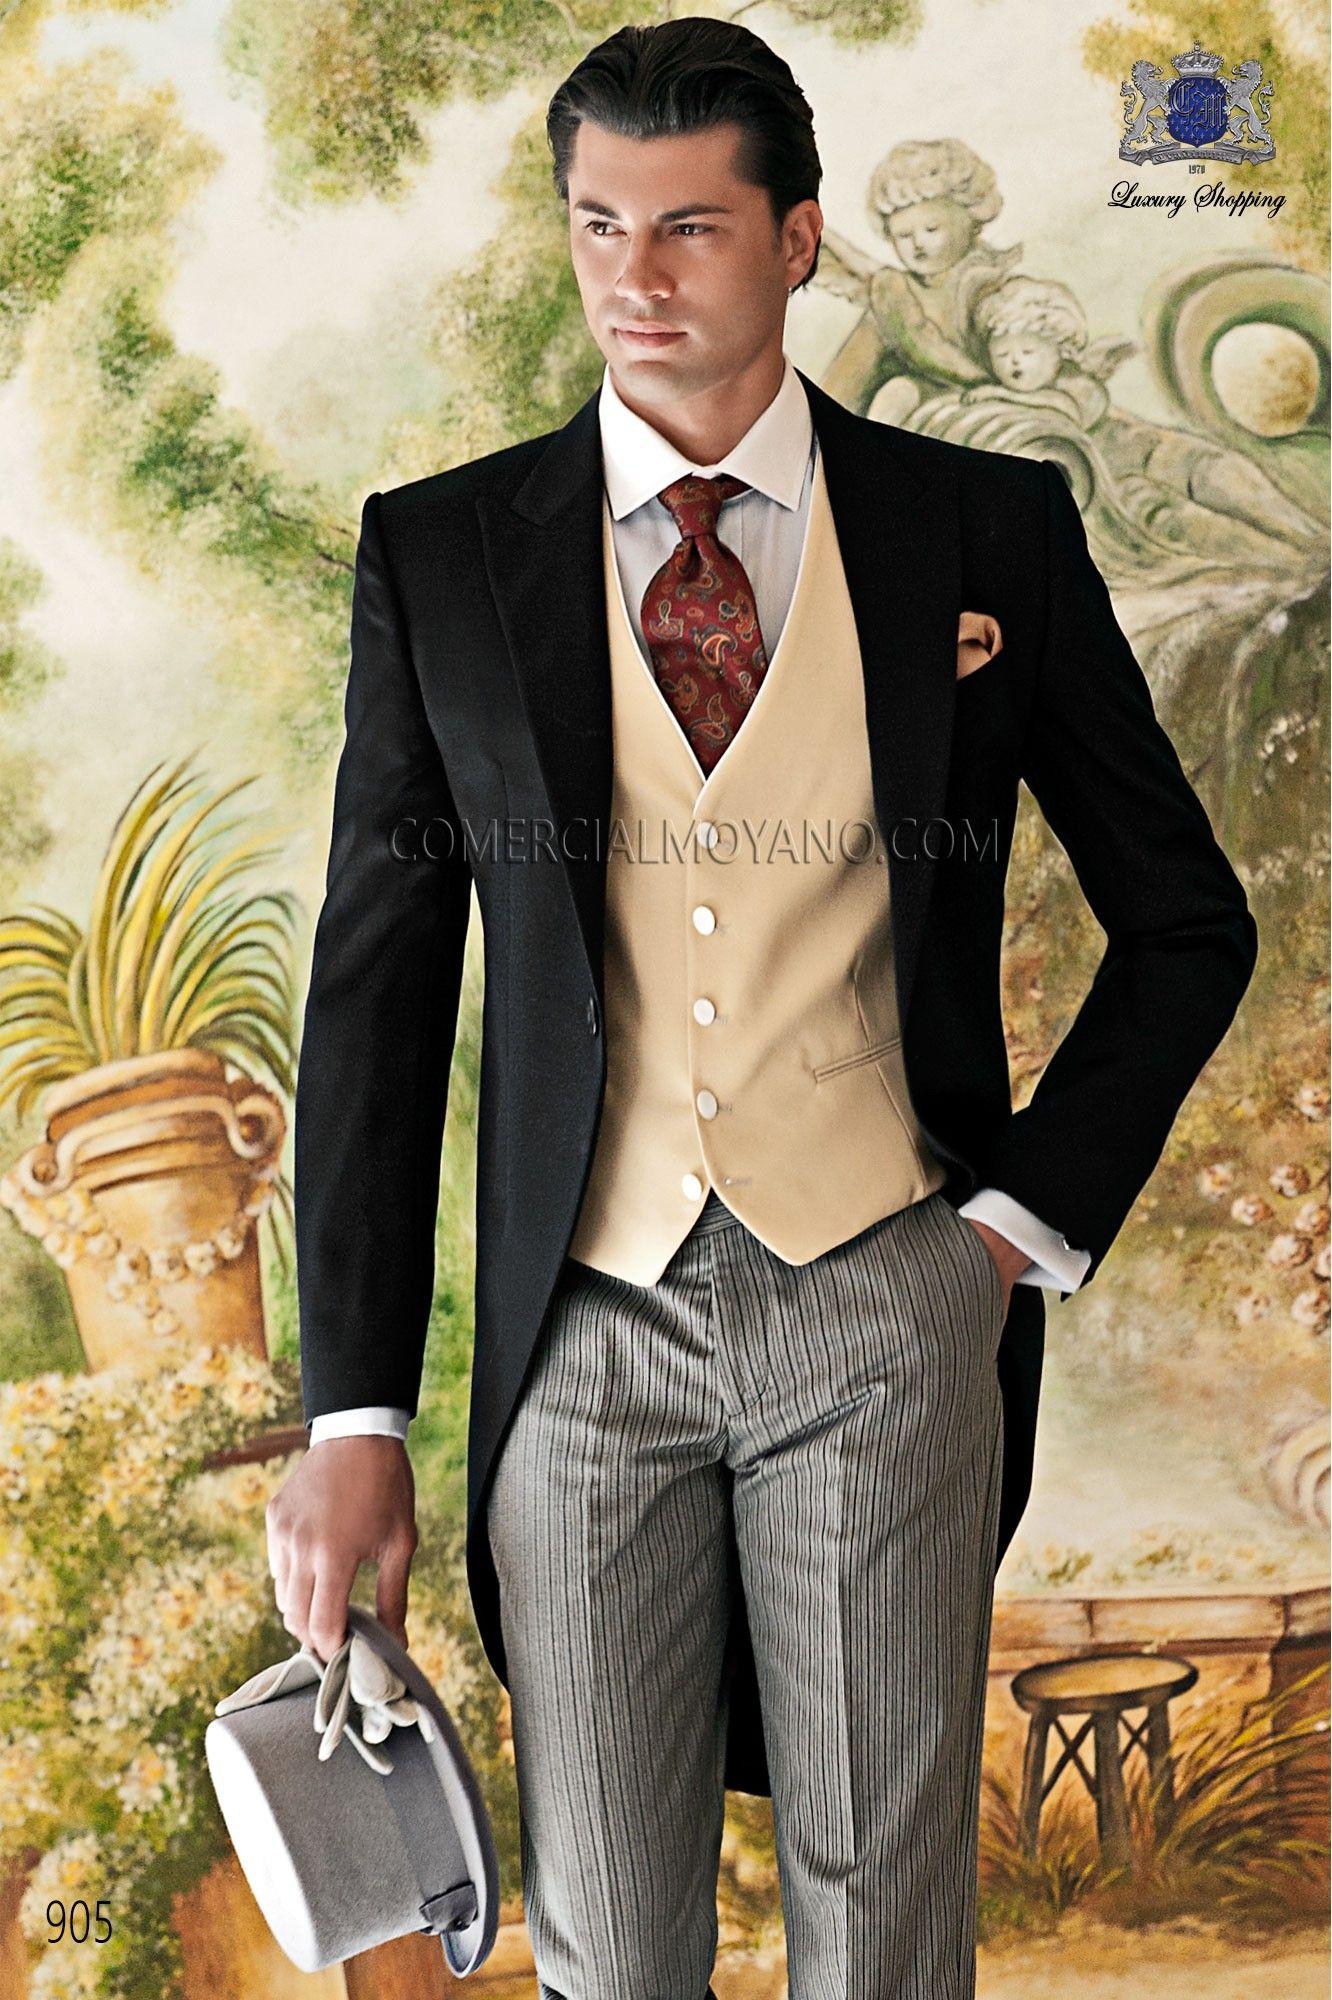 men in morning suit - Google Search   wedding   Pinterest   Morning ...